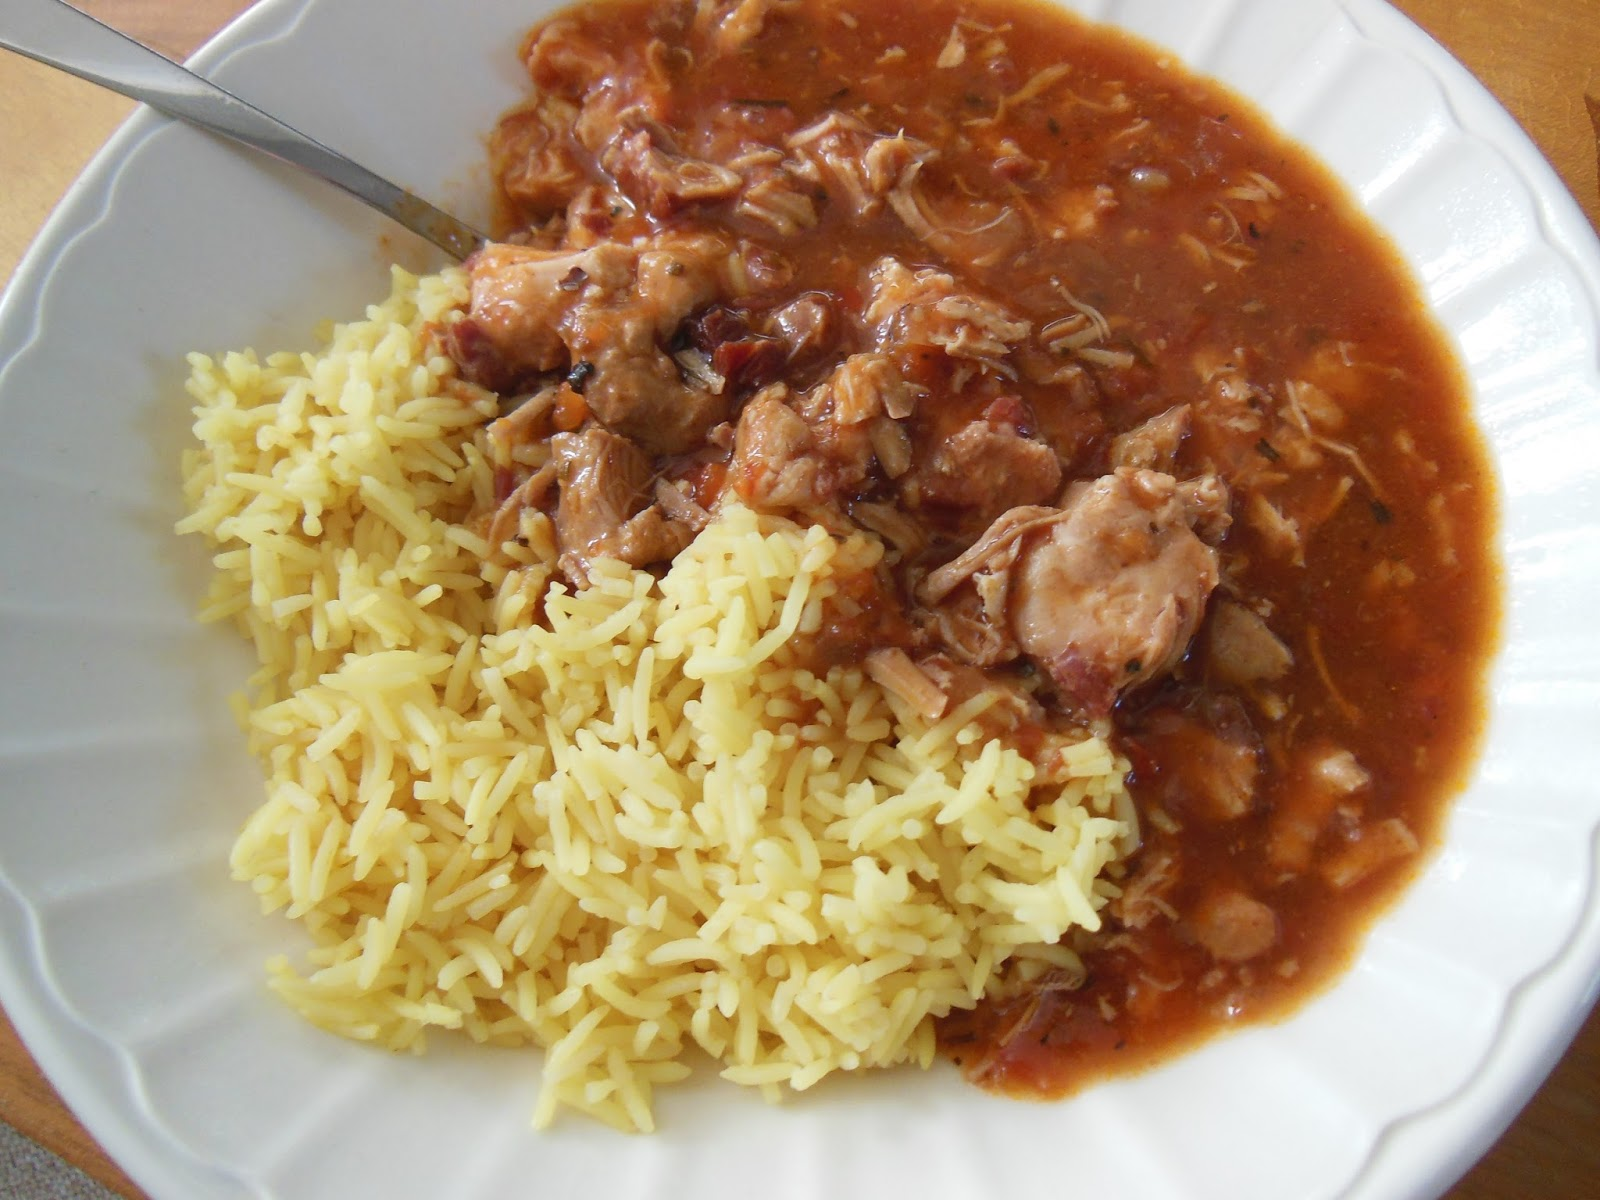 Ilumi pork, mushrooms and rice